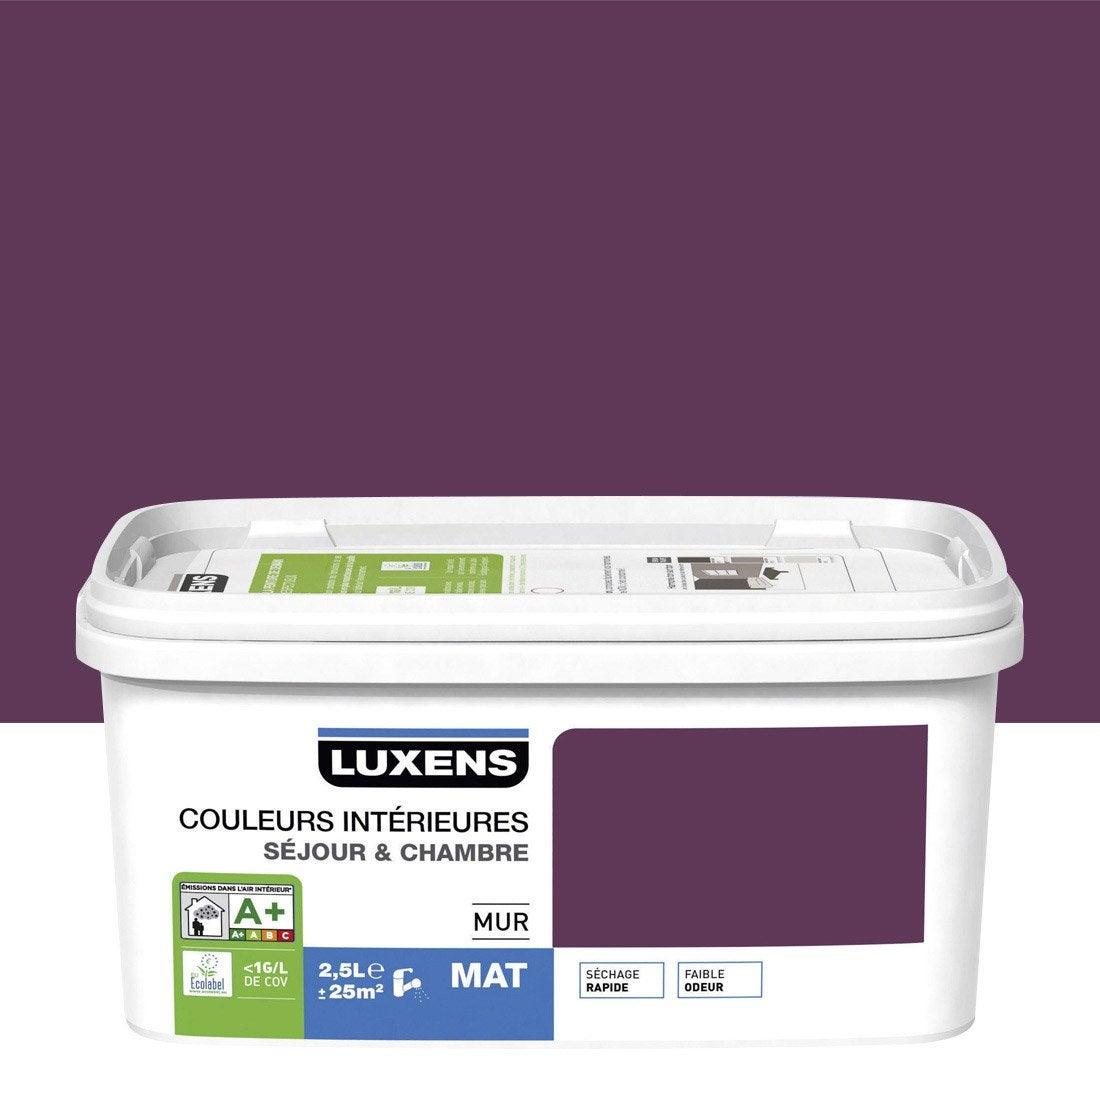 Peinture violet aubergine 2 luxens couleurs int rieures 2 5 l leroy merlin for Peinture teinte leroy merlin